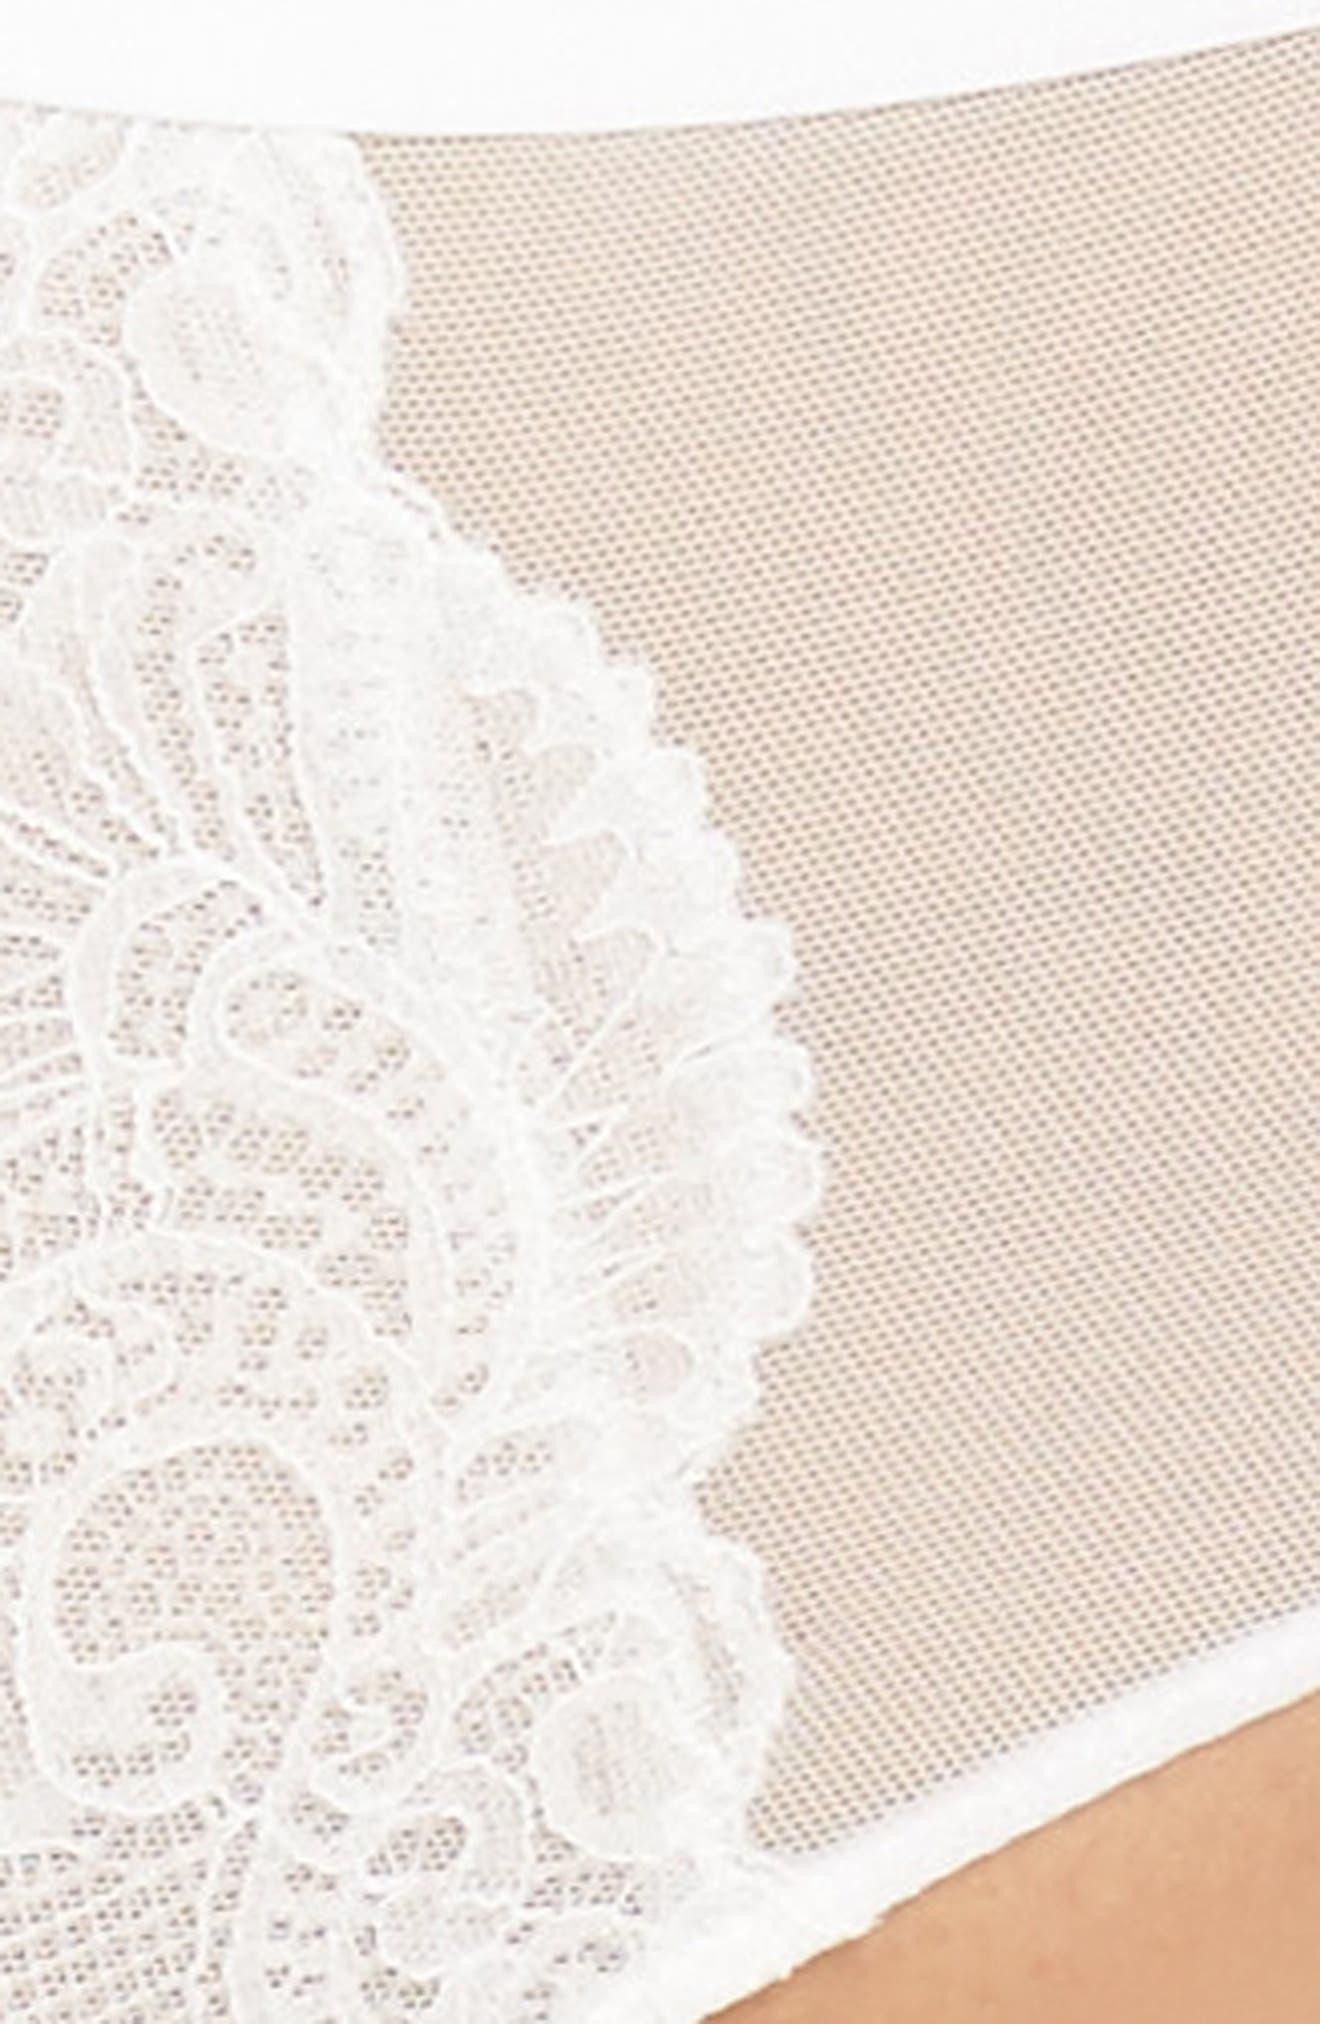 Intimately FP Jasmine High Waist Briefs,                             Alternate thumbnail 20, color,